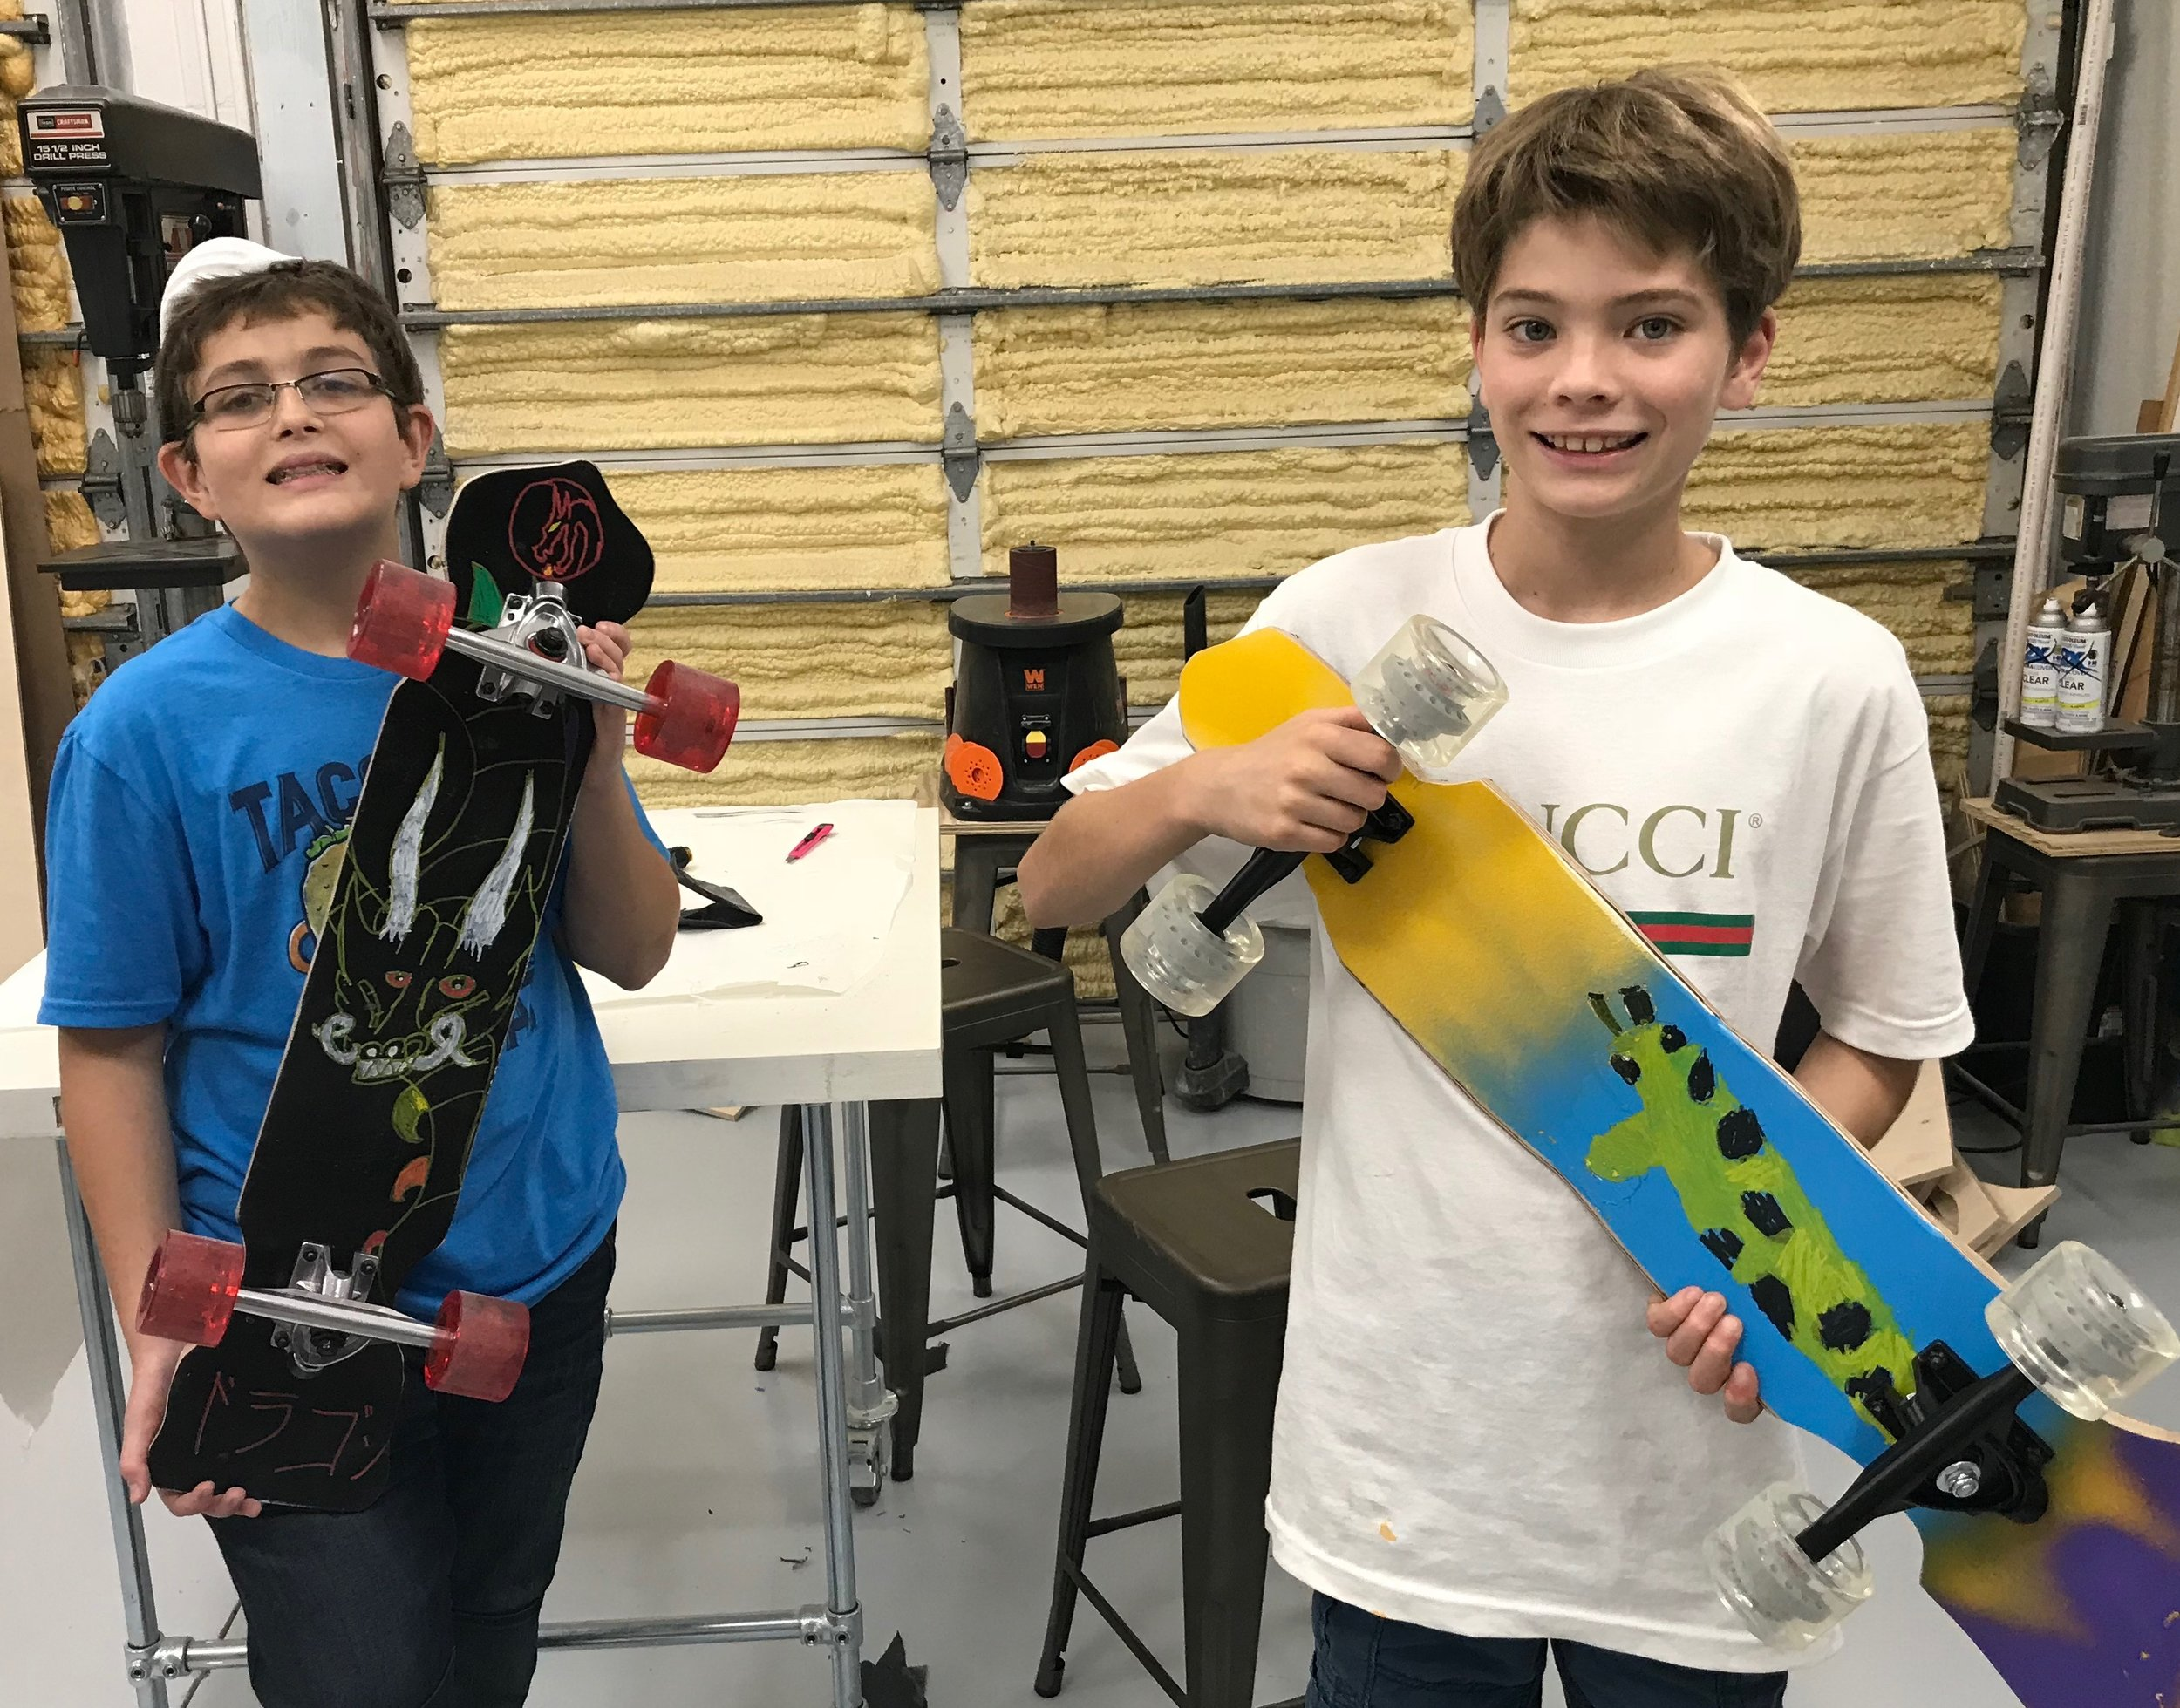 DIY Skateboards - BEST - 25 of 36.jpg